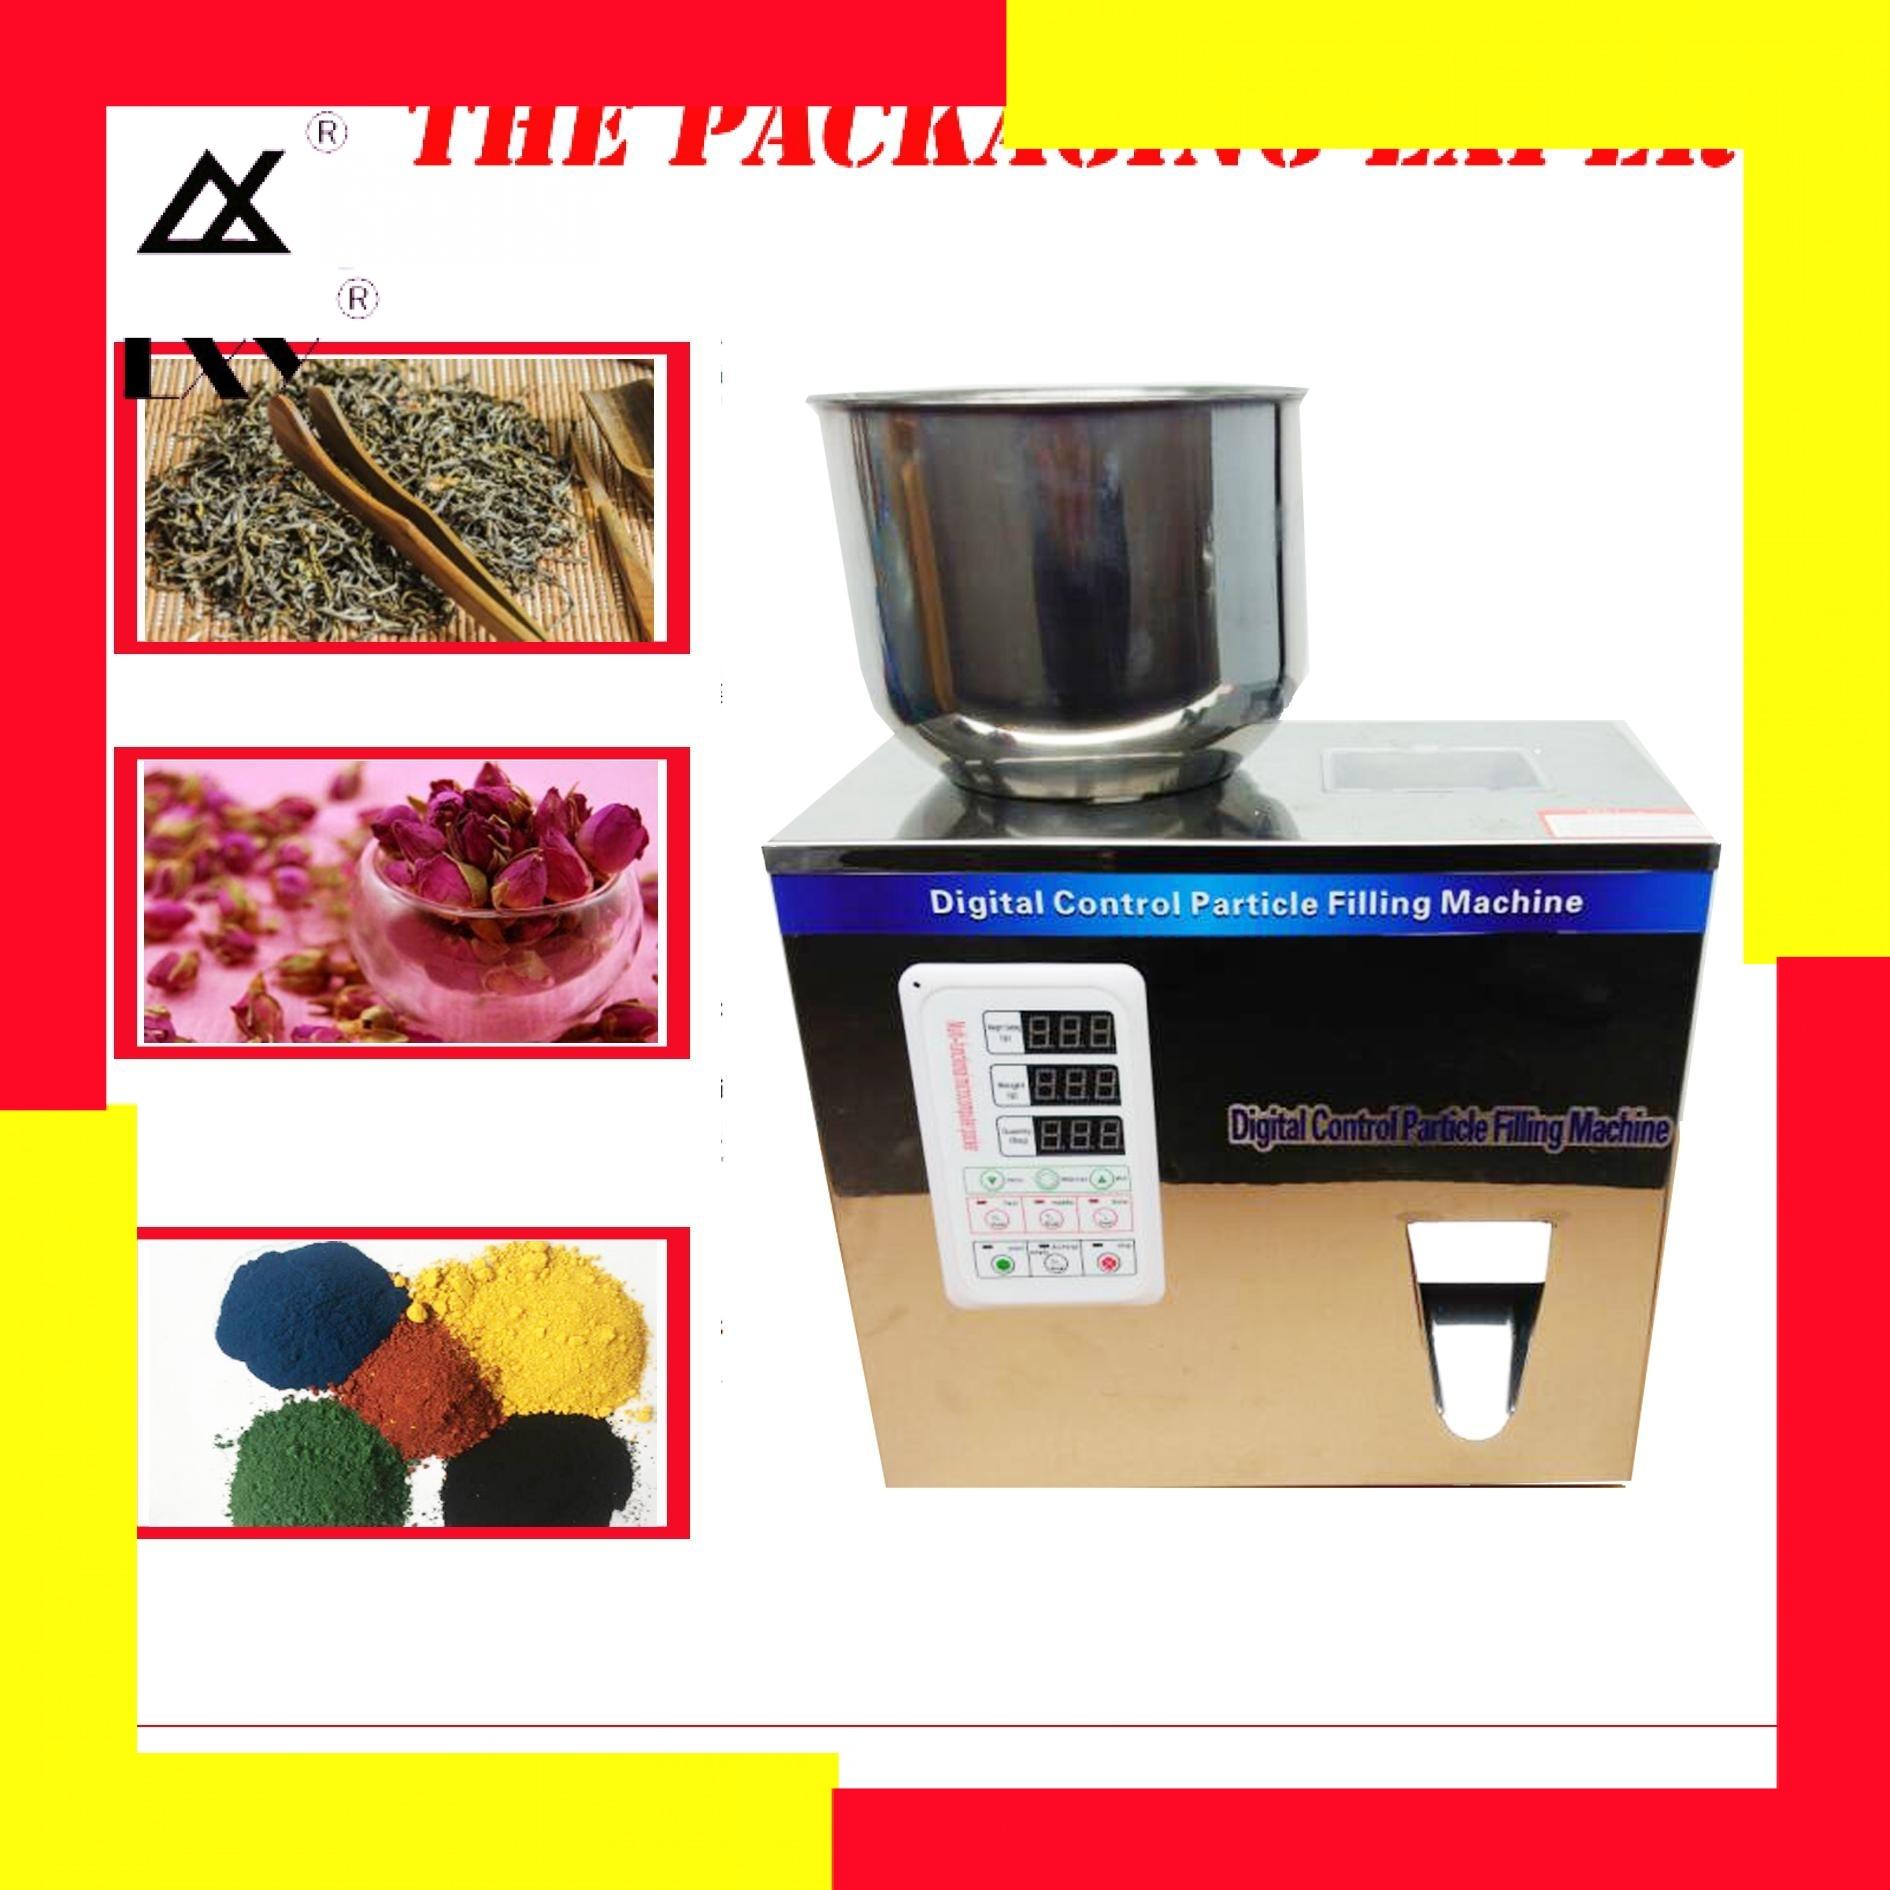 50g Scale Herb Seed Salt Rice Milk Powder Weighting Filling Racking Machine Tea Leaf Packing Capsule Food Flower Filler Doser